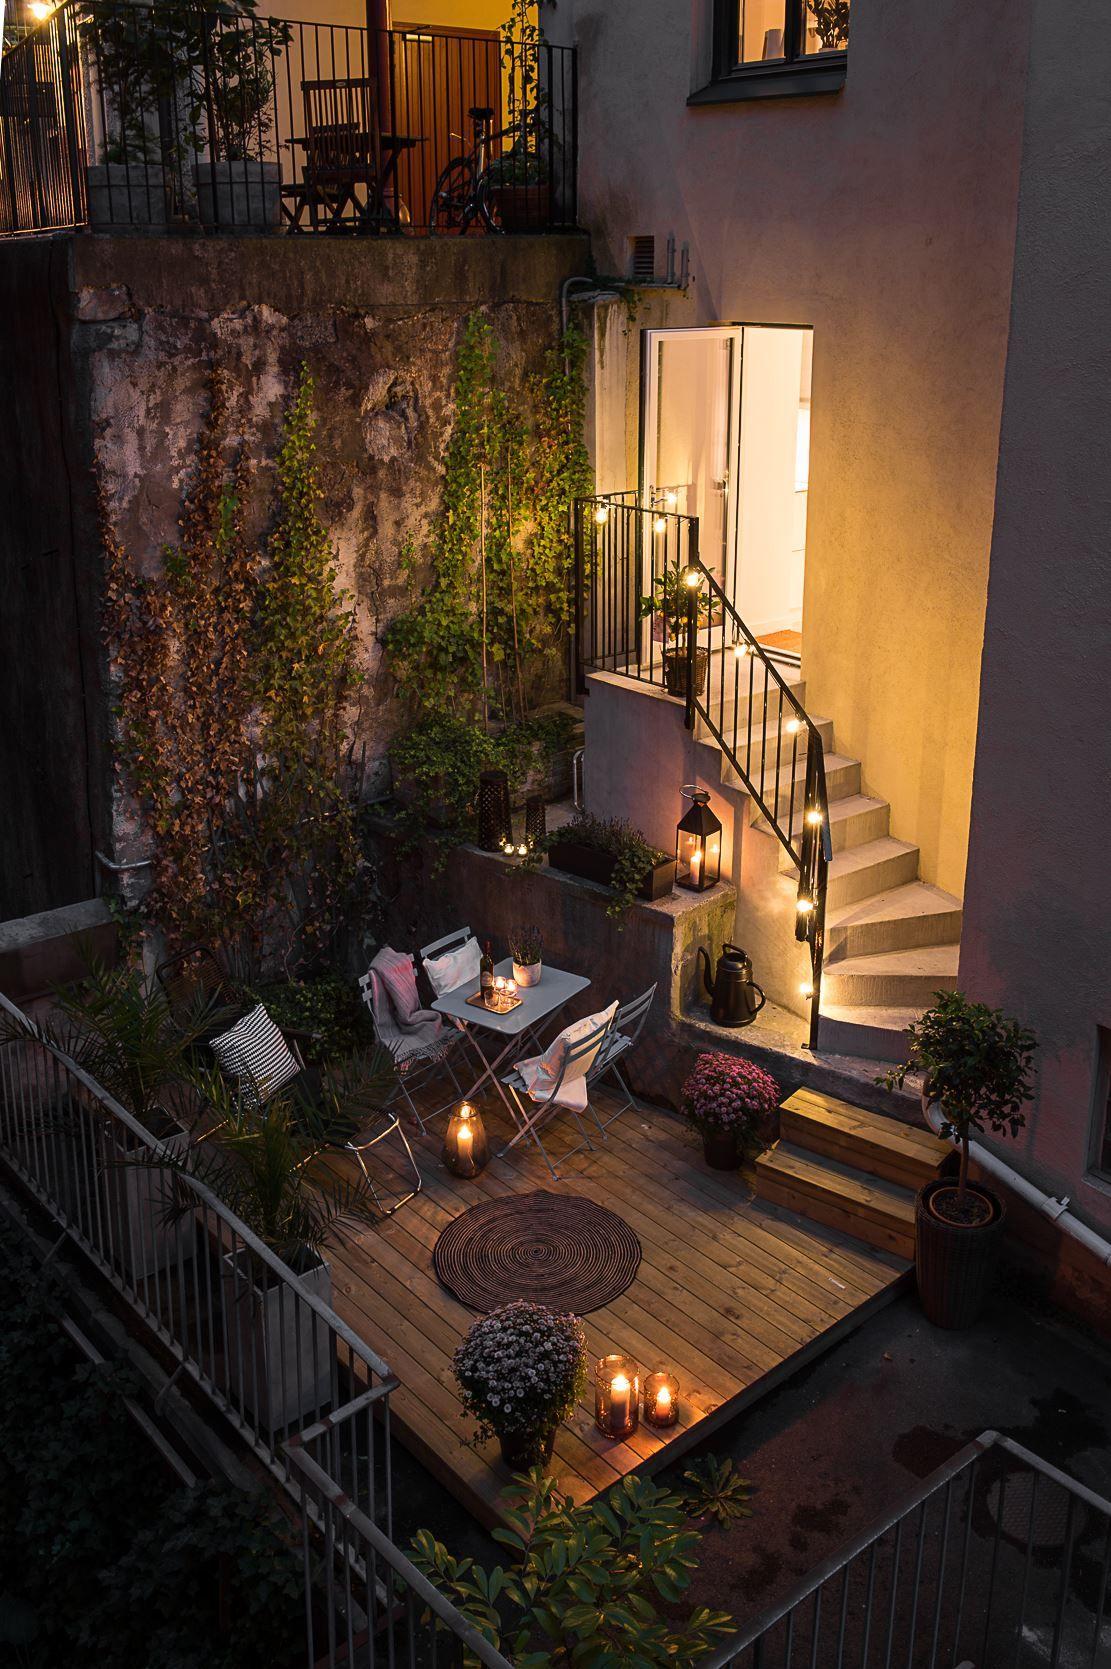 Pin van Tatiana op Home ideas and decor | Pinterest - Tuin, Terras ...